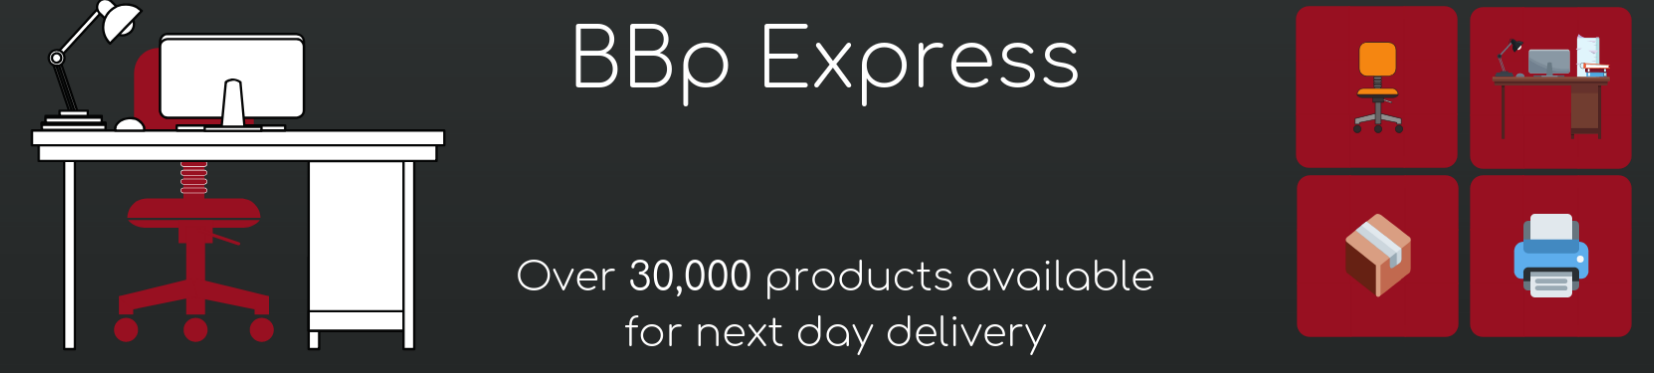 BBp Express Sales